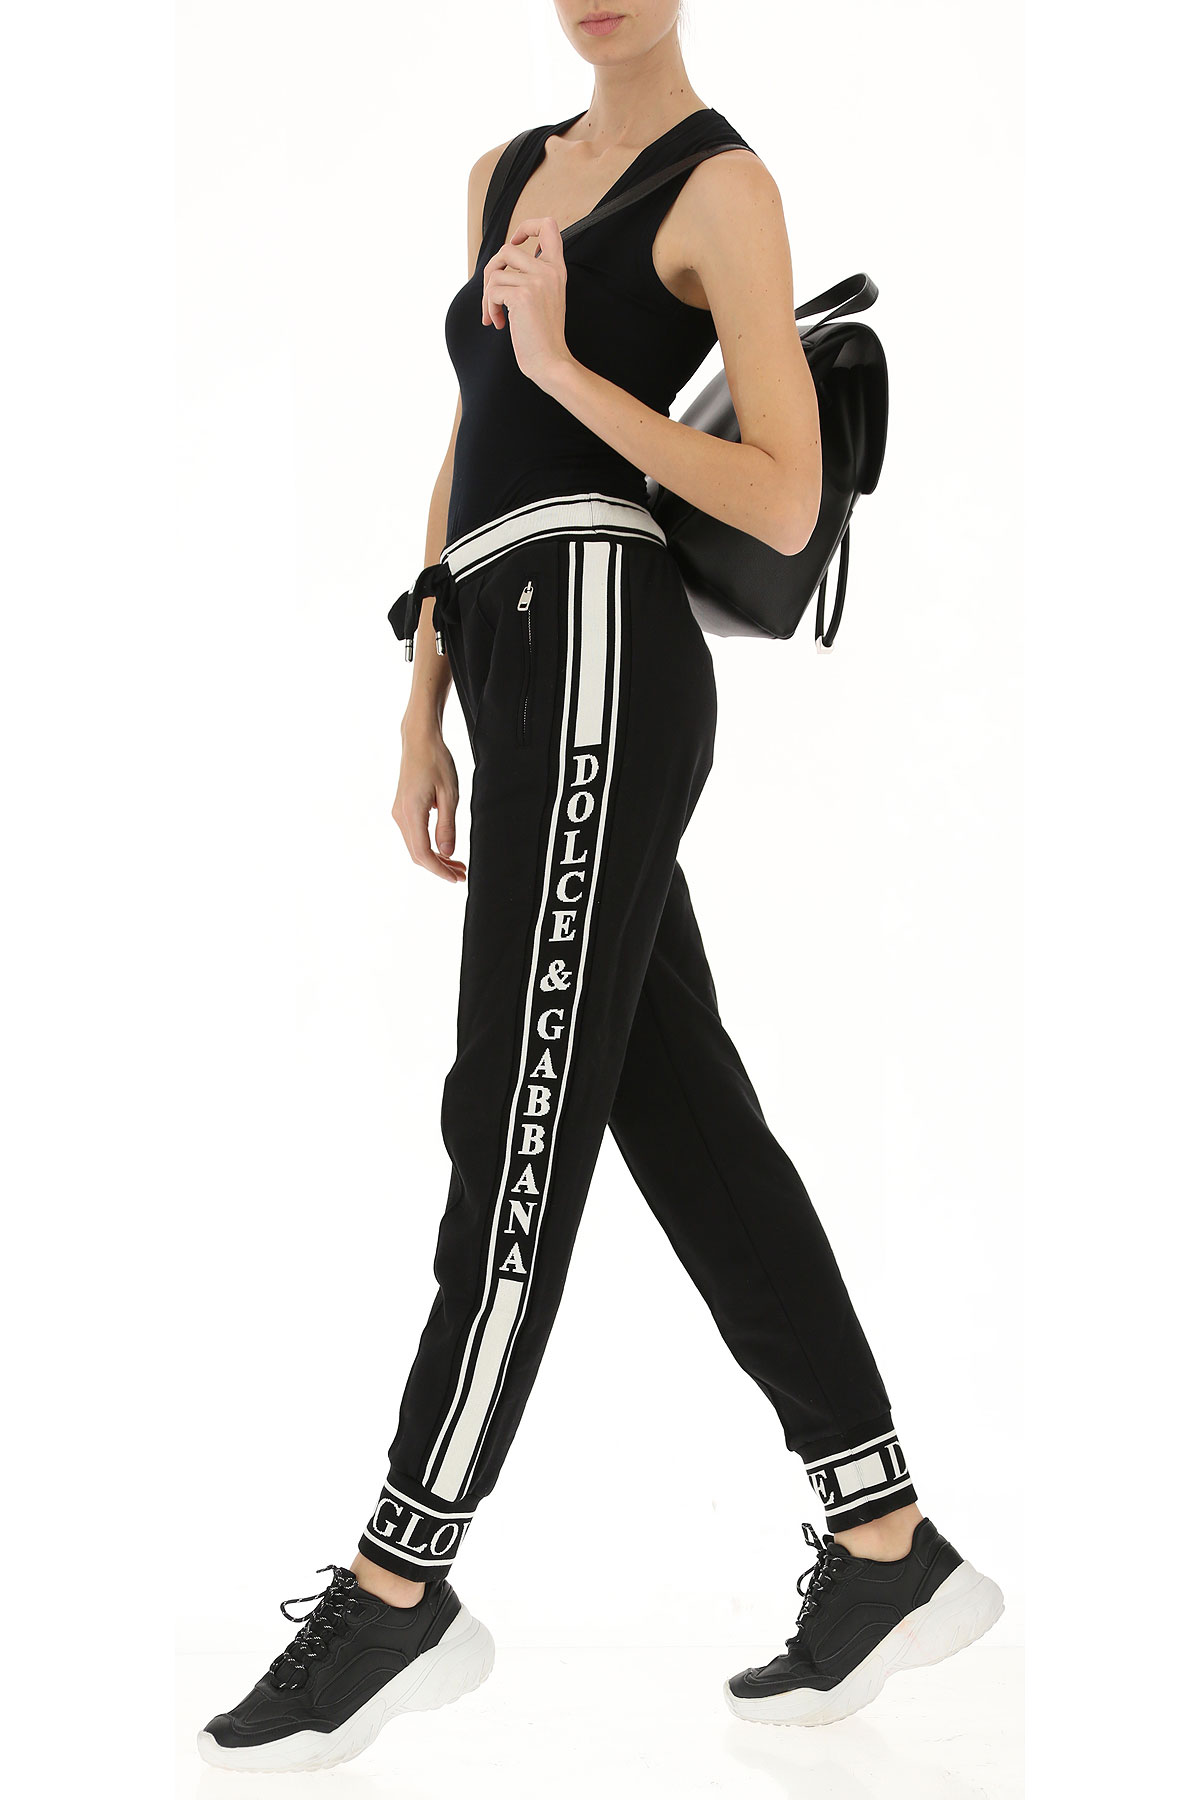 verano Ropa Negro 2019 Dolce Gabbana Mujer amp; Para Primavera Blanco 6Y8nWHq